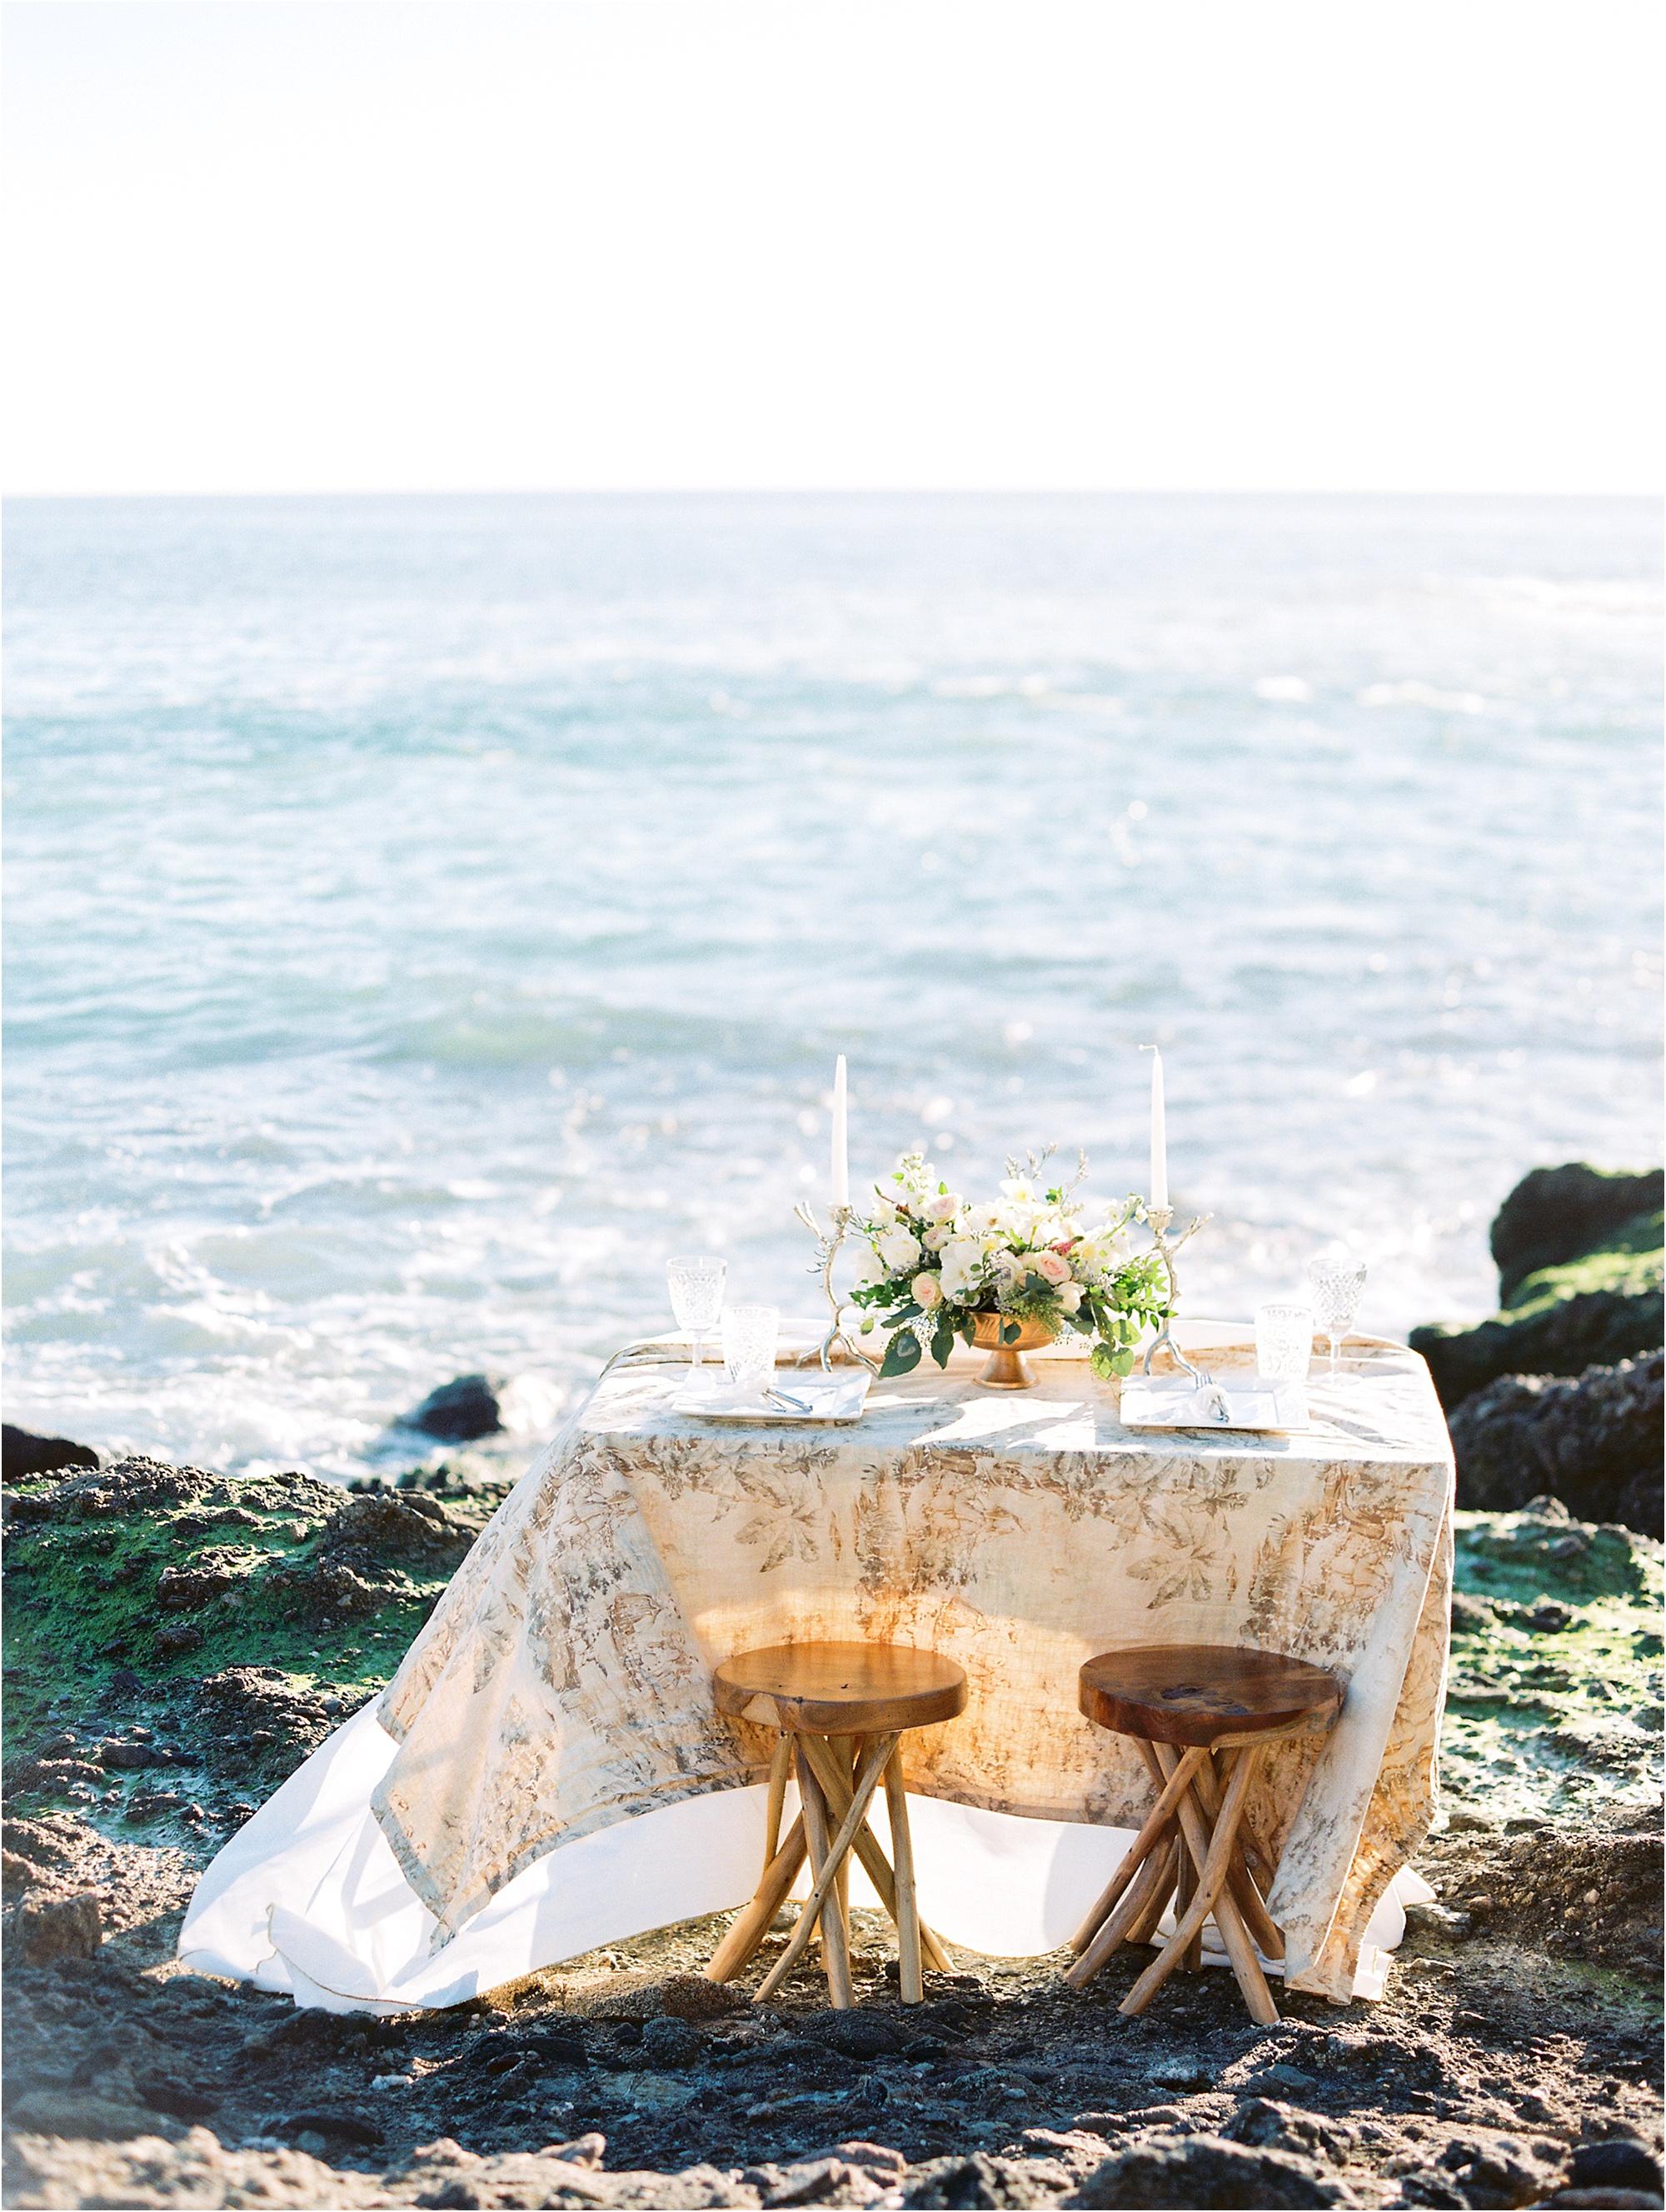 victoria-beach-wedding-inspiration-4.jpg